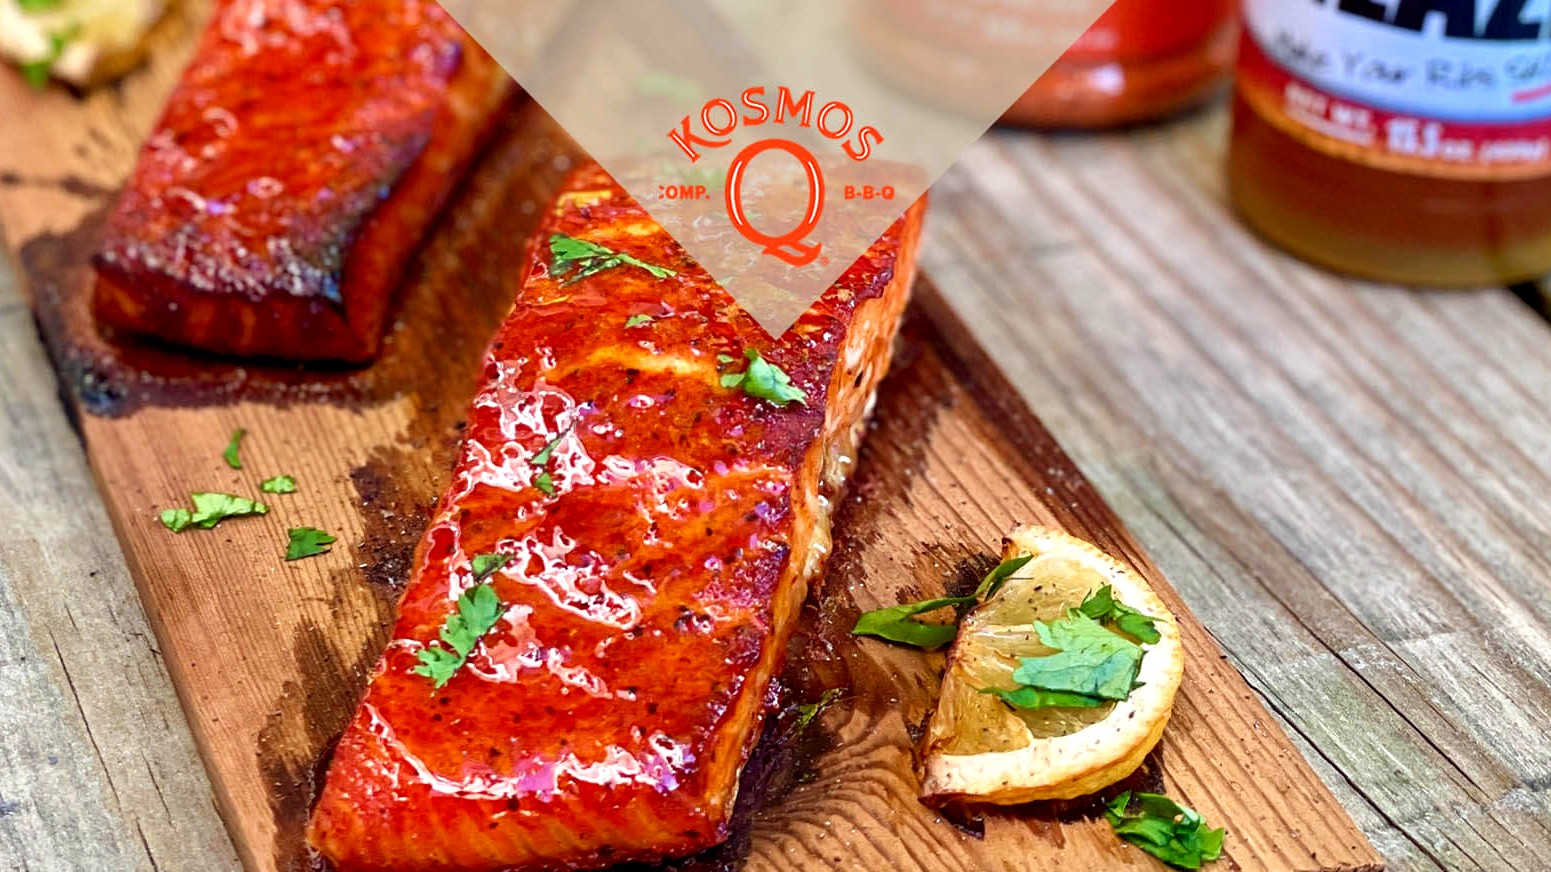 Image of Grilled & Glazed Salmon